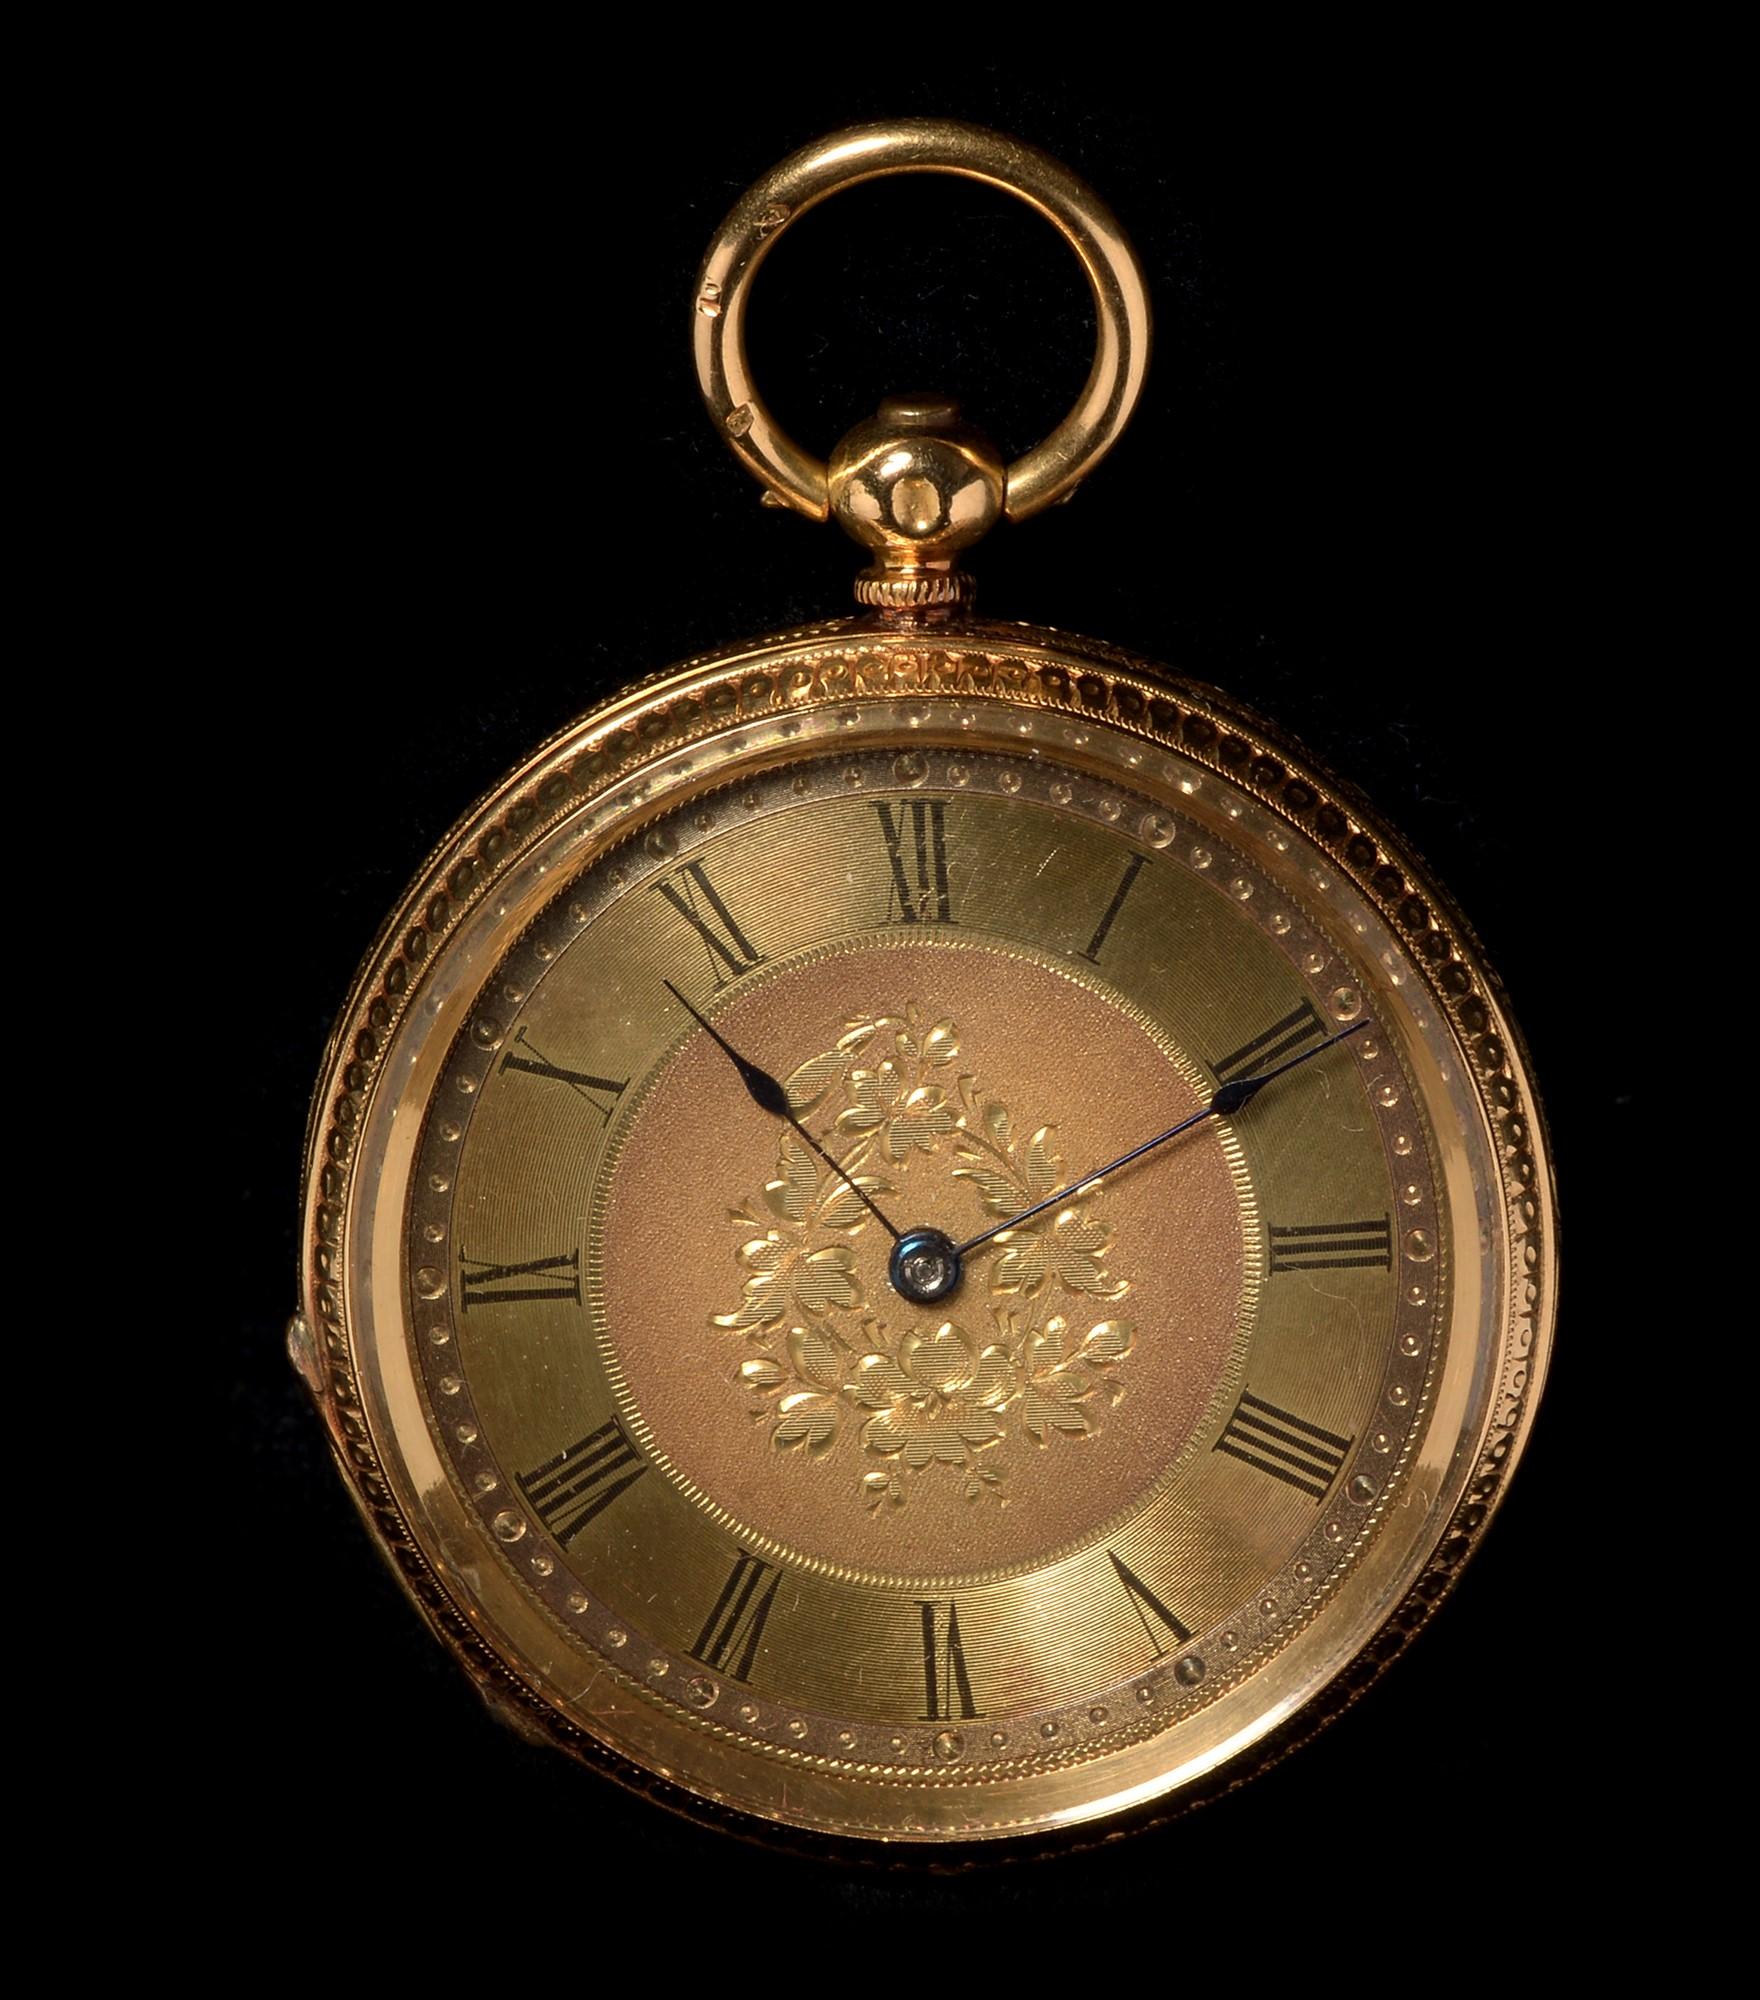 Lot 9 - 18ct gold pocket watch